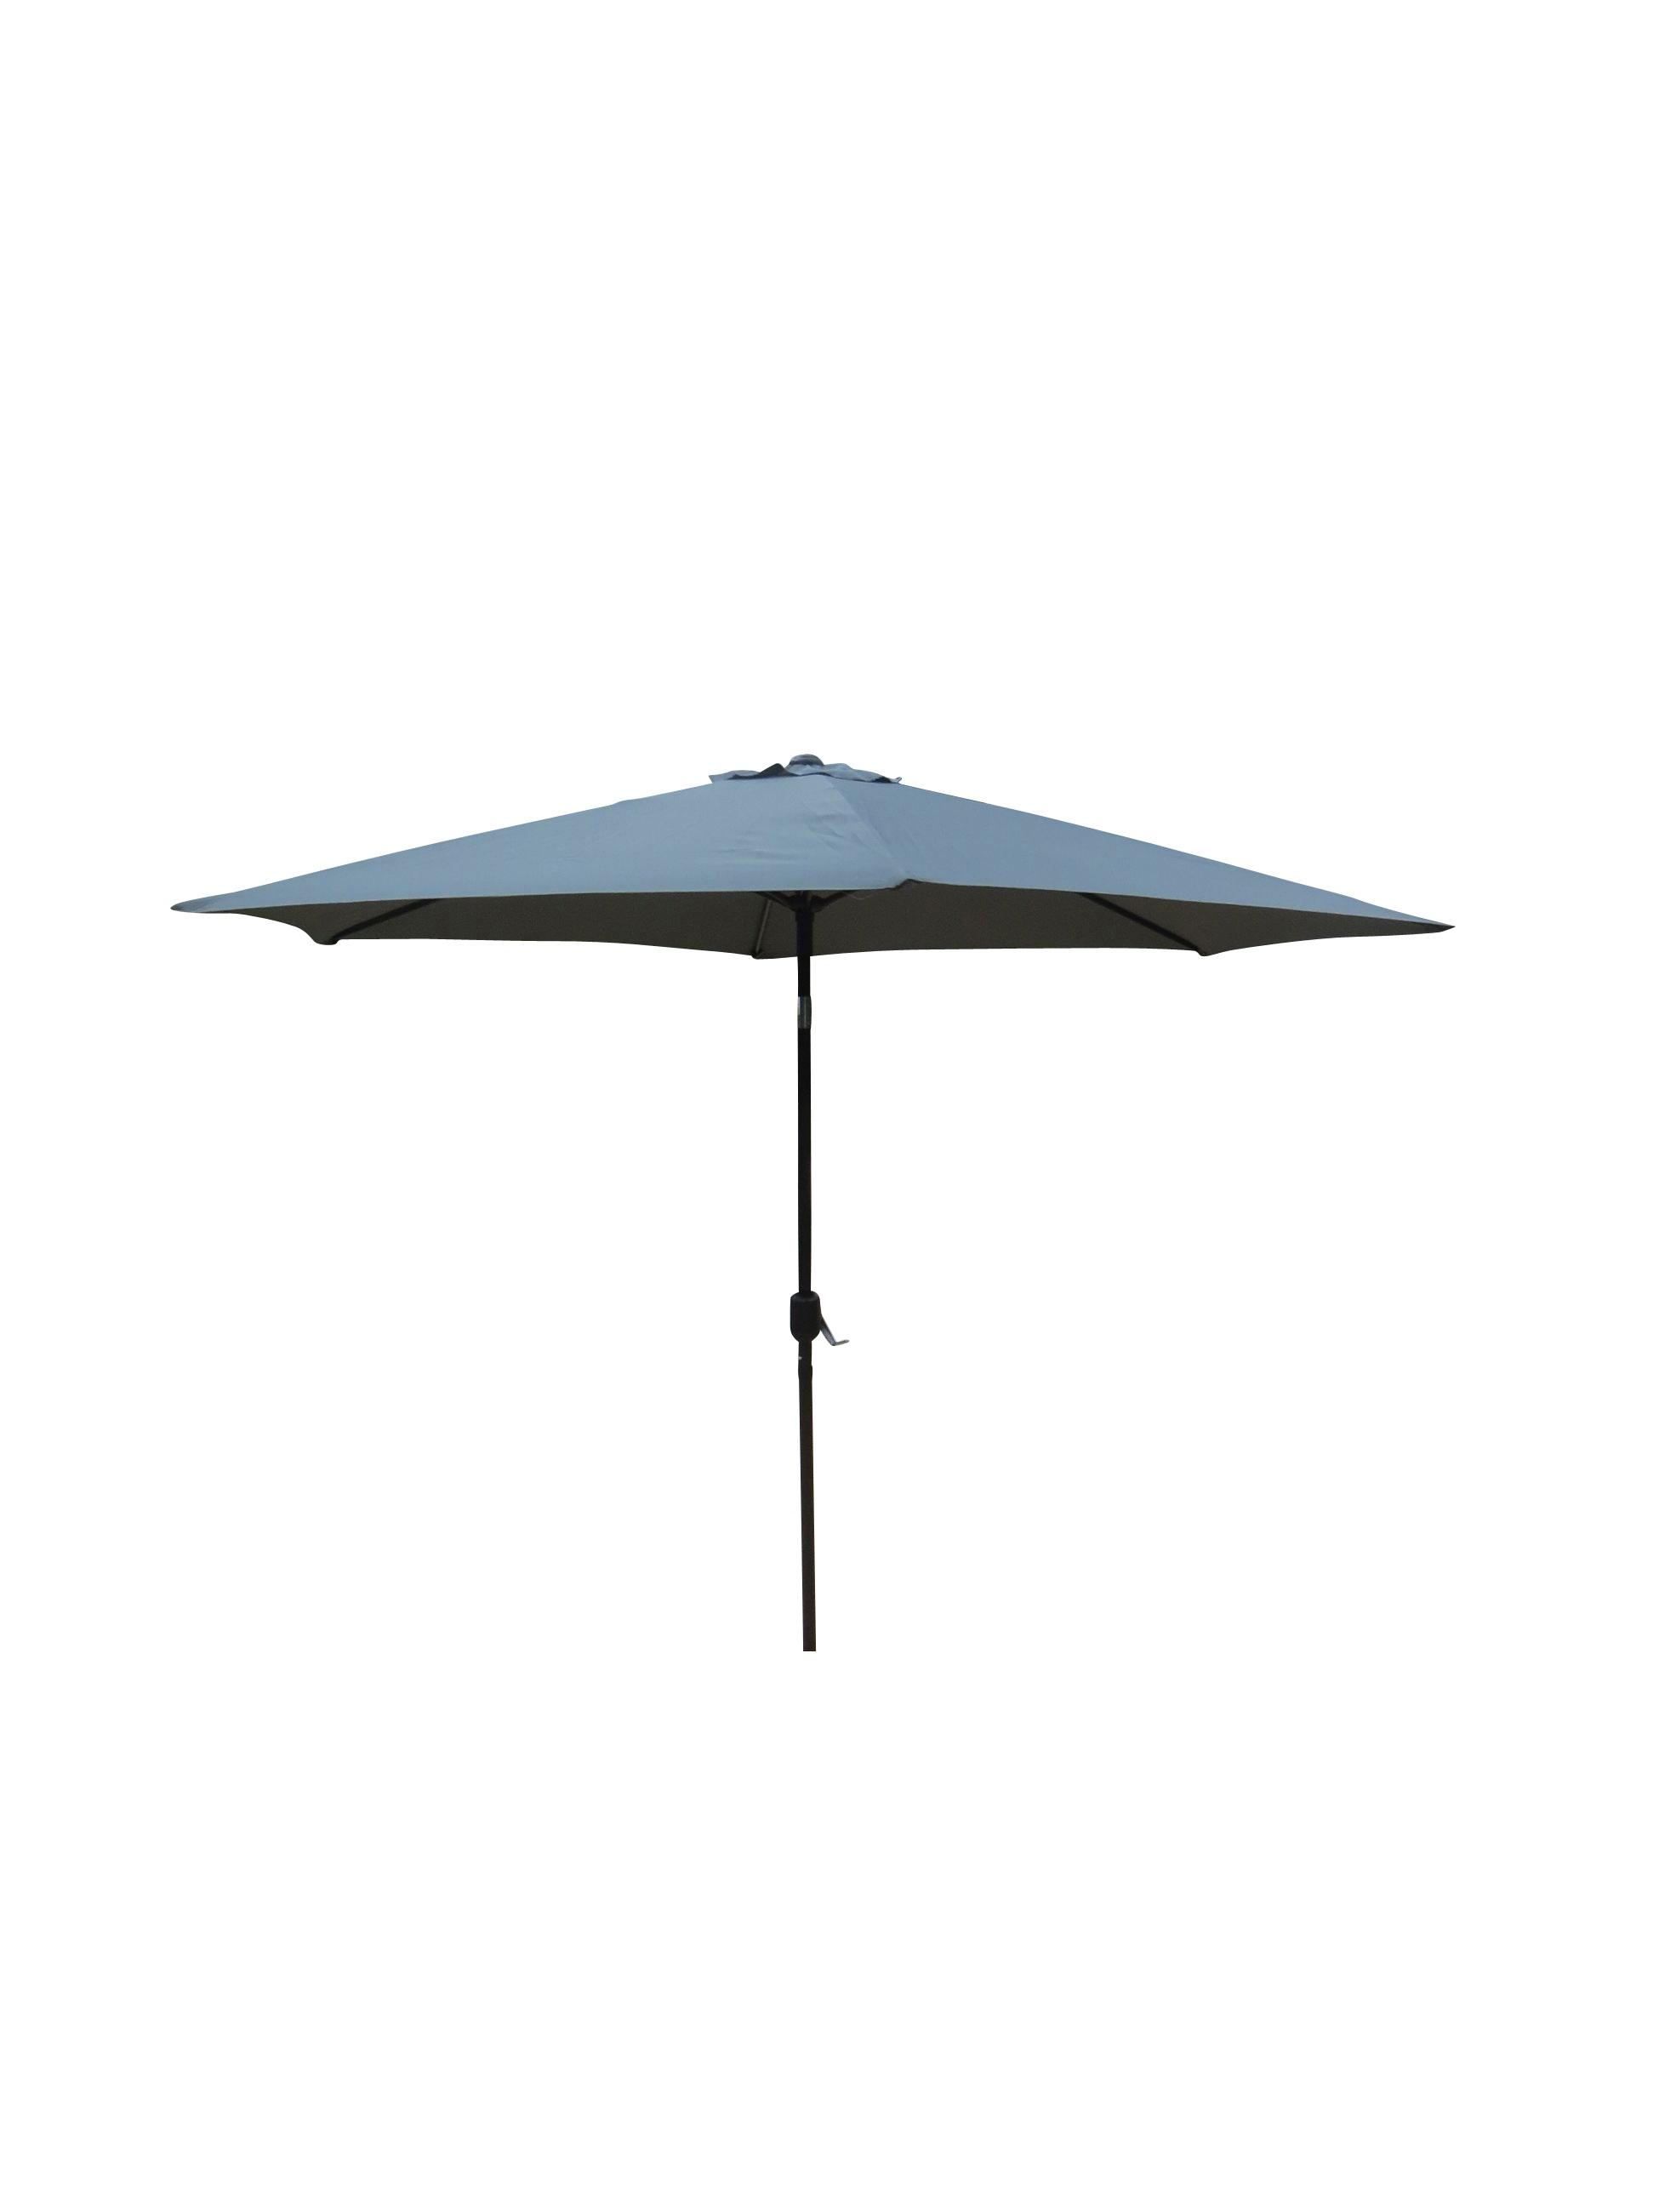 tenerife sonnenschirm kurbelschirm rund 300cm knickbar sonnenschirme sonnenschutz garten. Black Bedroom Furniture Sets. Home Design Ideas